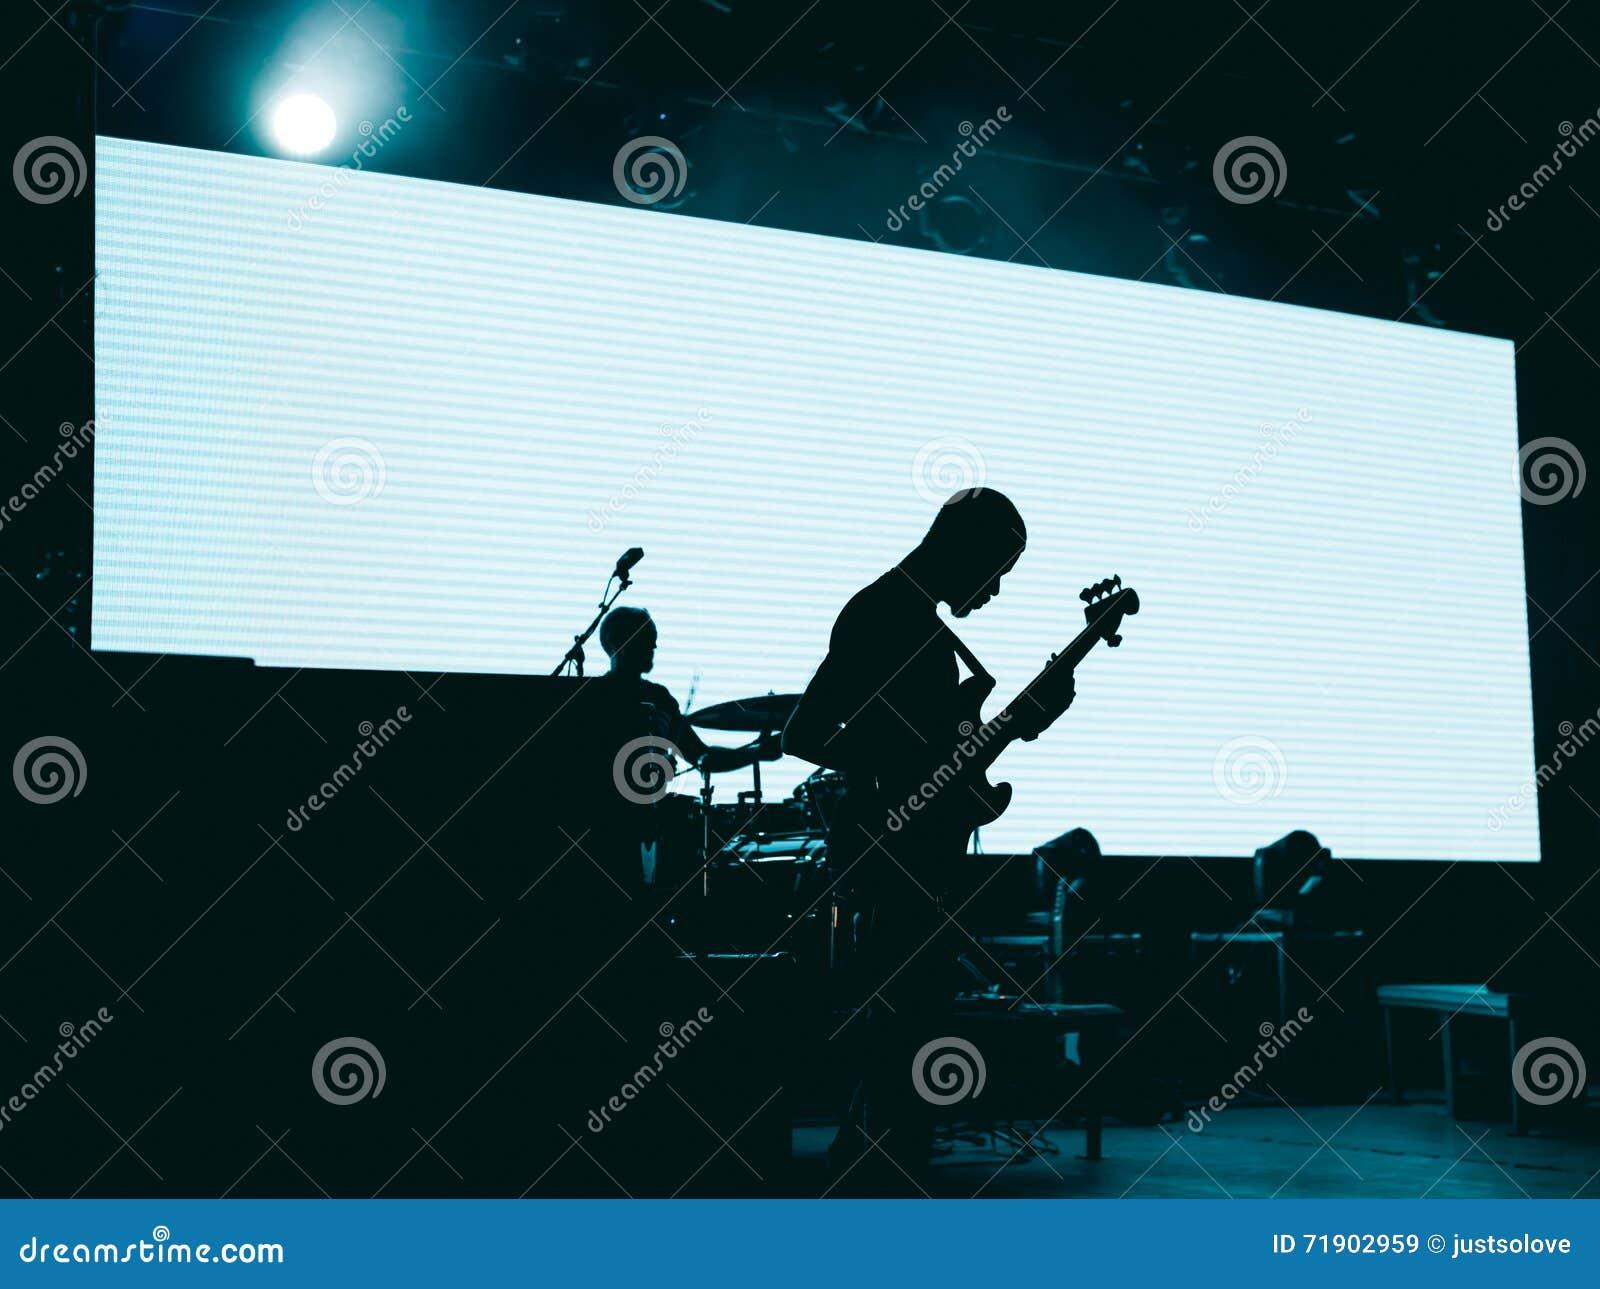 Pics photos rock concert background - Blurred Background Light On Rock Concert